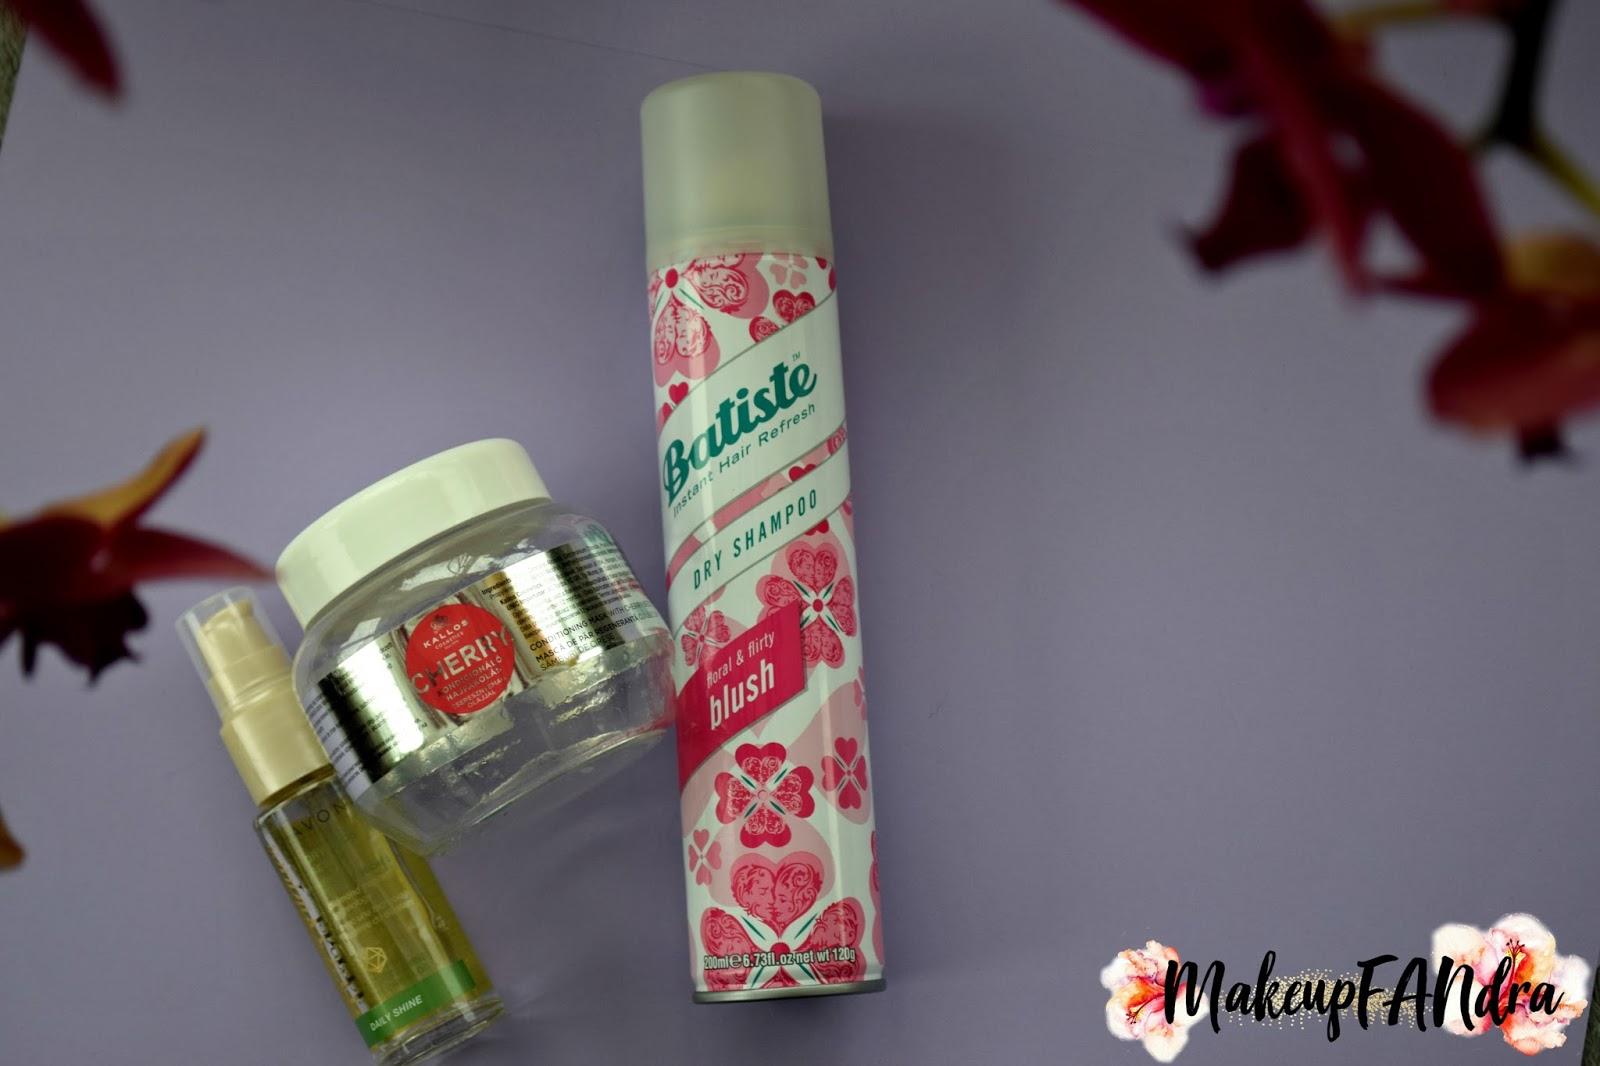 Avon-ulje-za-kosu-Kallos-Cosmetics-maska-za-kosu-Batiste-suhi-šampon